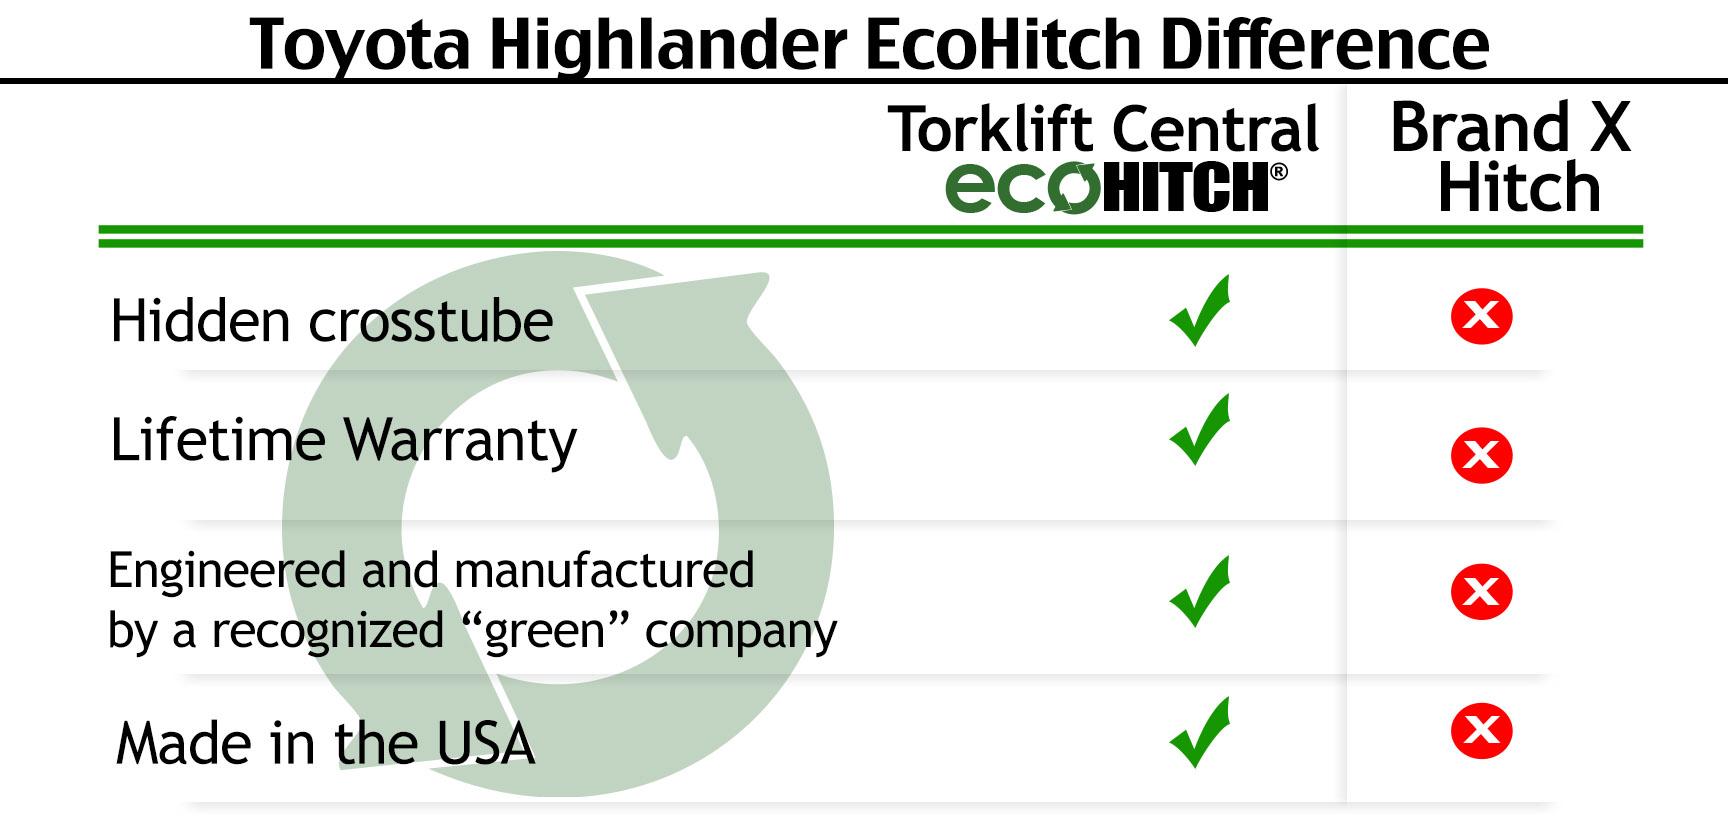 Toyota Highlander Towing Capacity >> Torklift Central   Torklift Central   2014-2018 Toyota Highlander EcoHitch